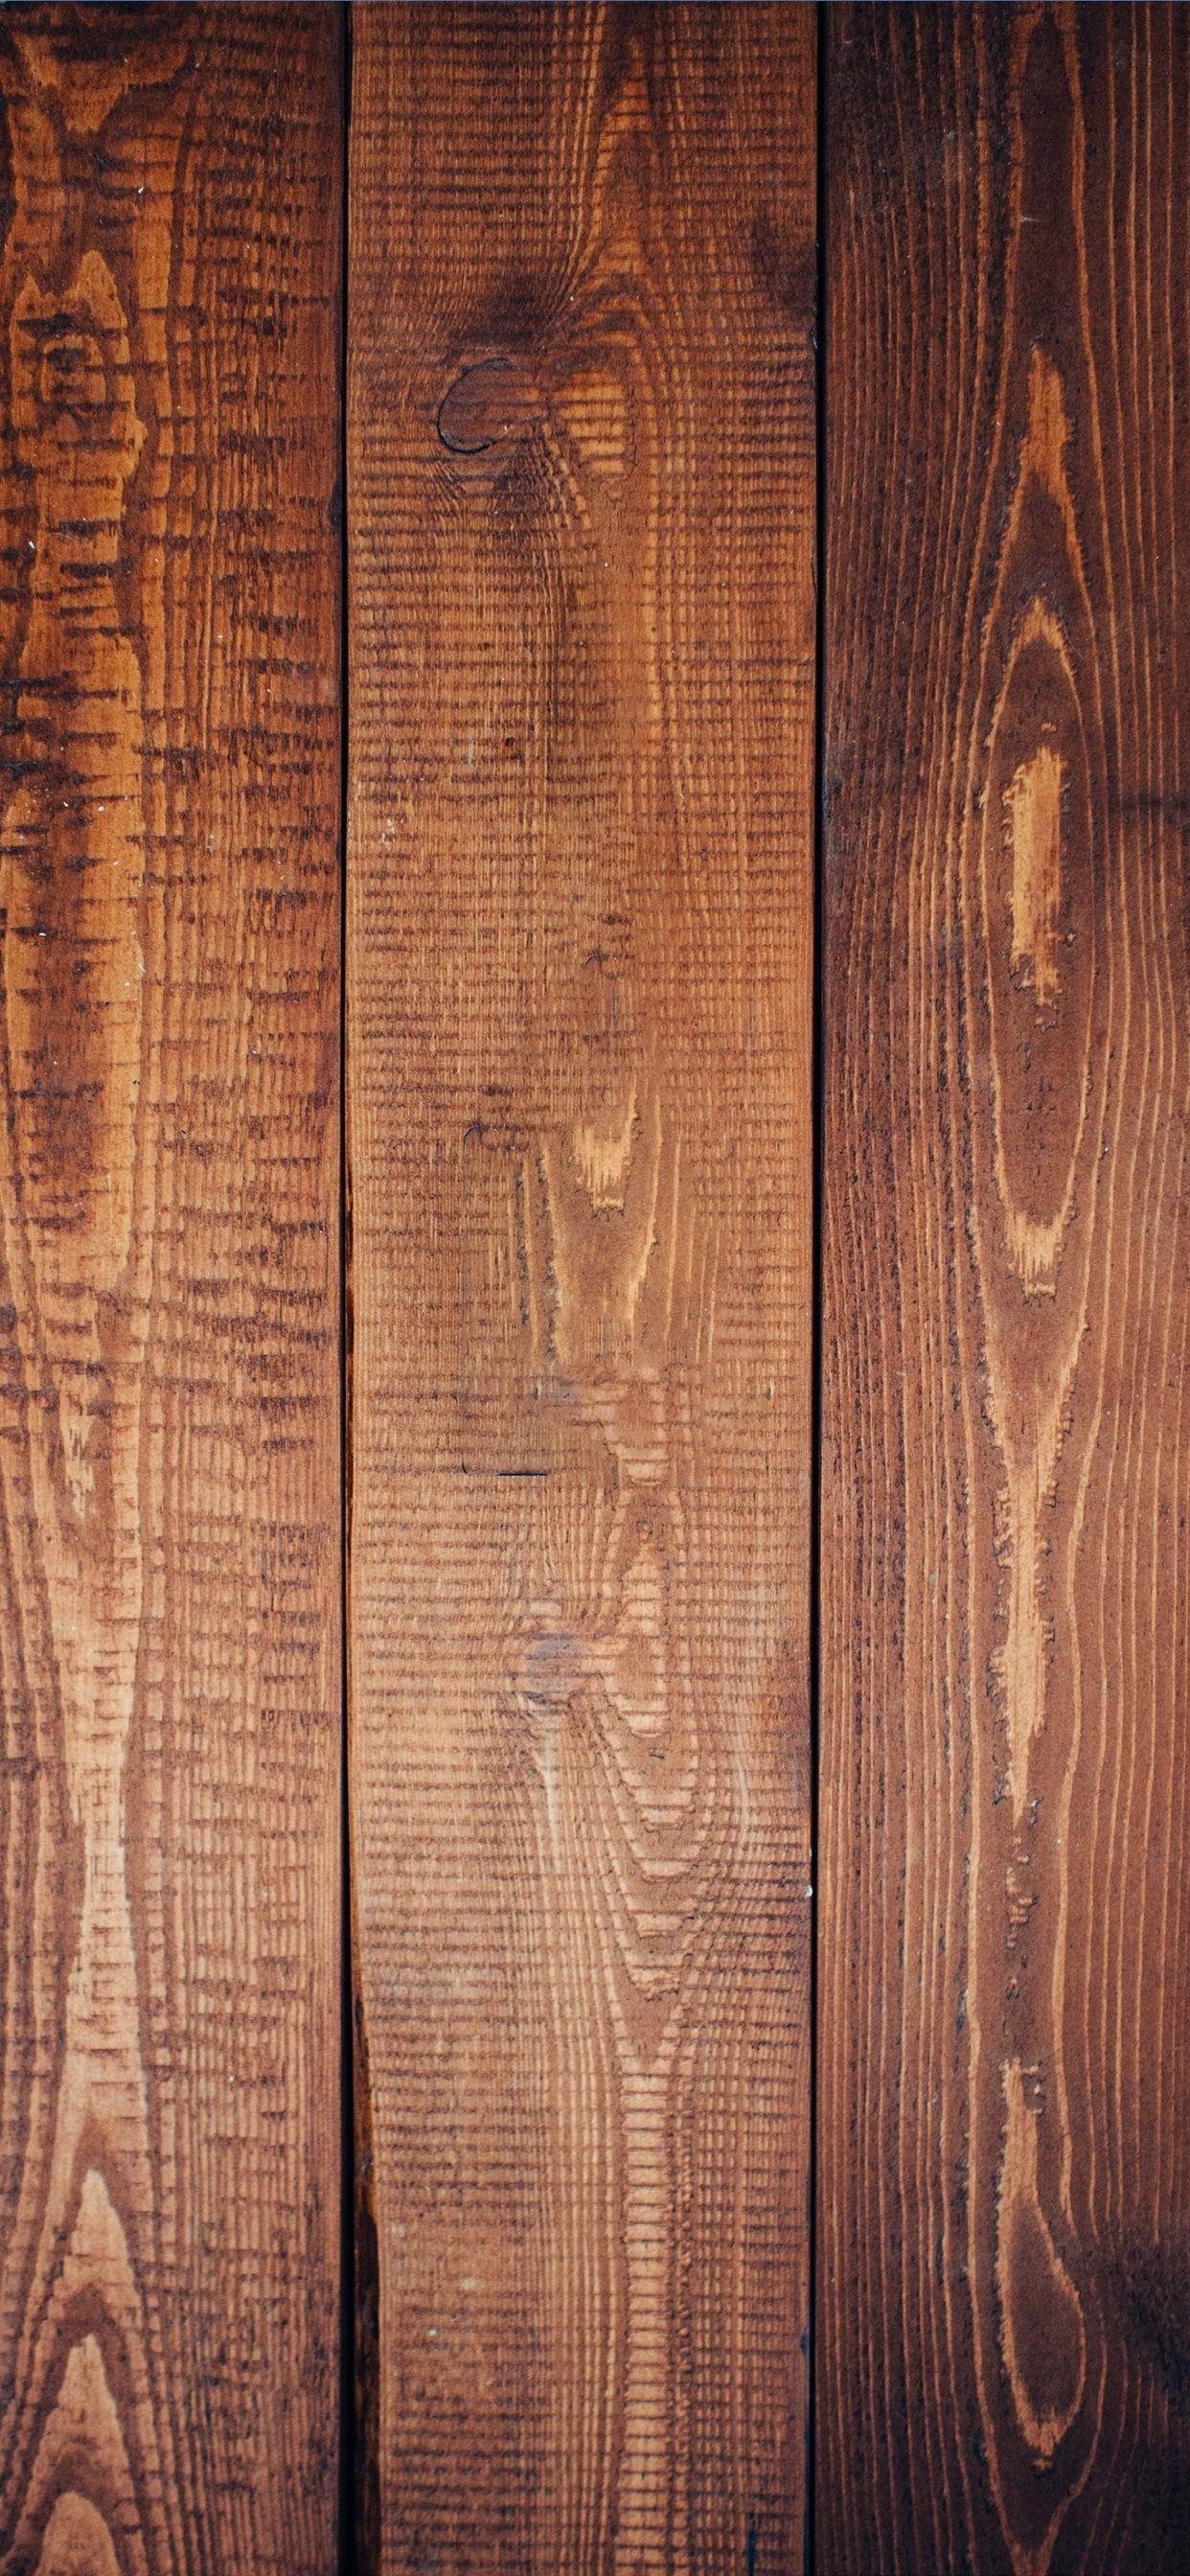 Download Iphone Xs Max Wallpaper Wood Wood Iphone Wallpaper Background Hd Wallpaper Huawei Wallpapers